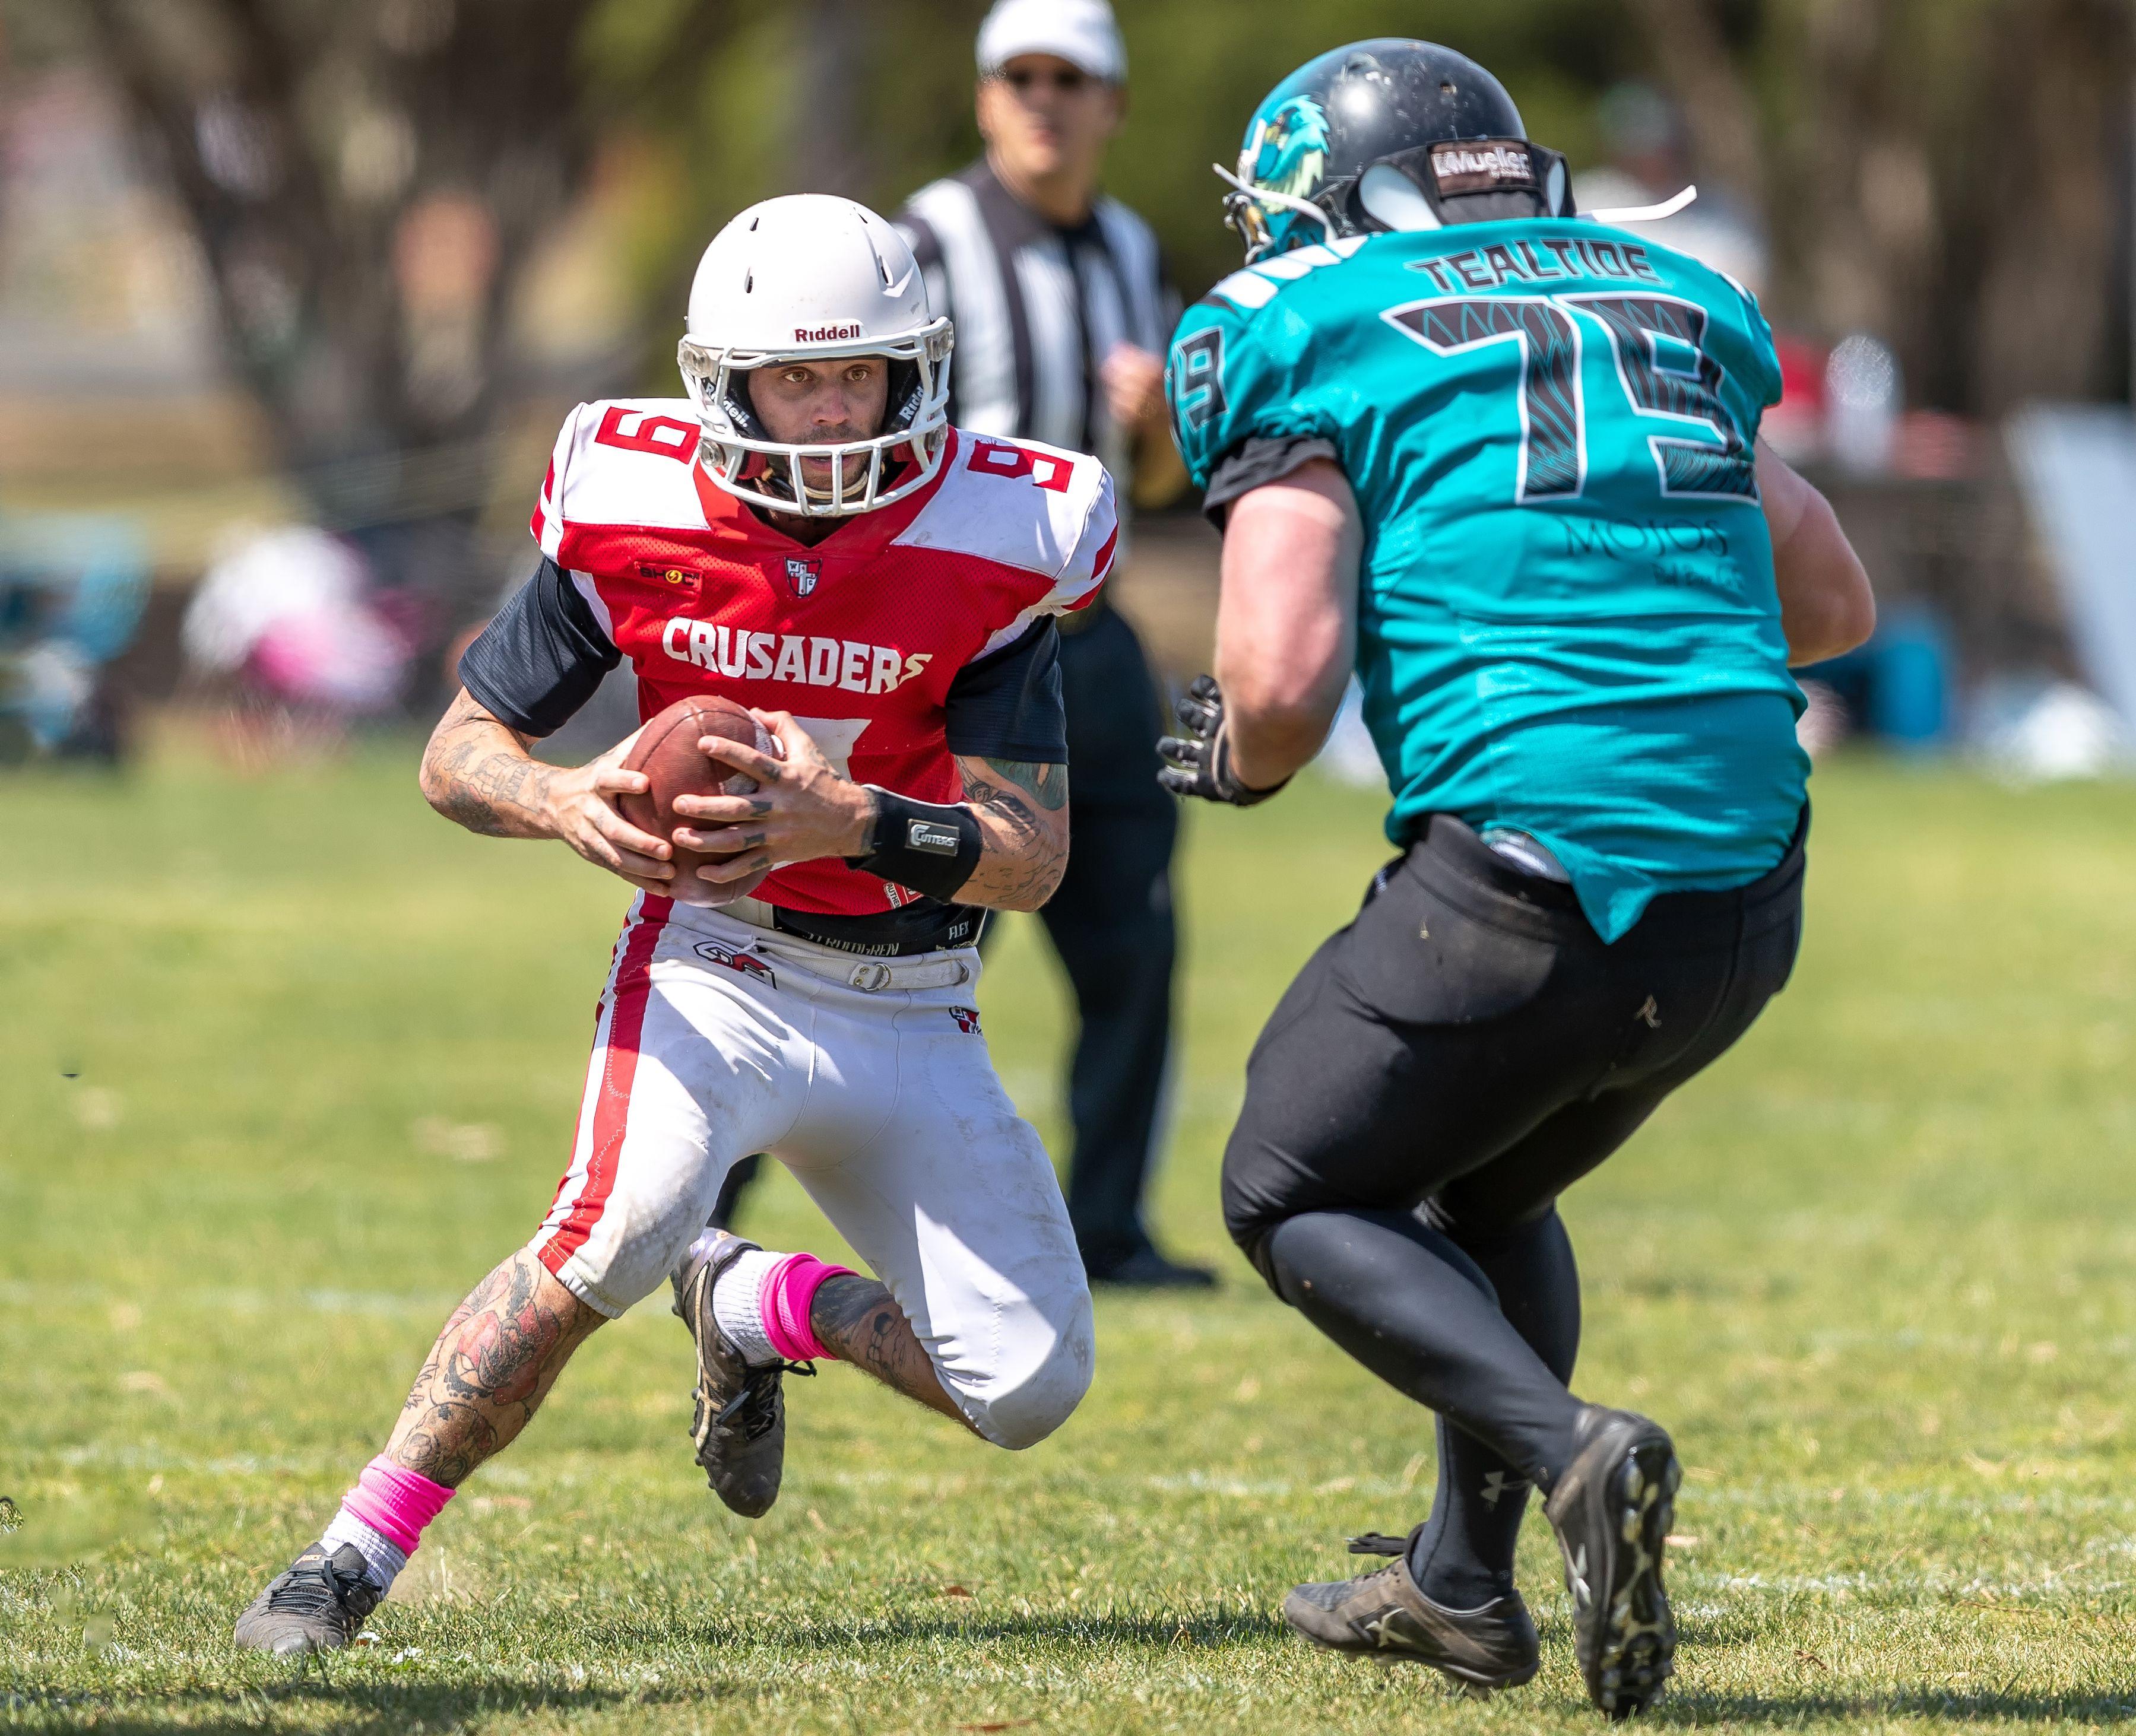 Gridiron Victoria American football league, Gridiron